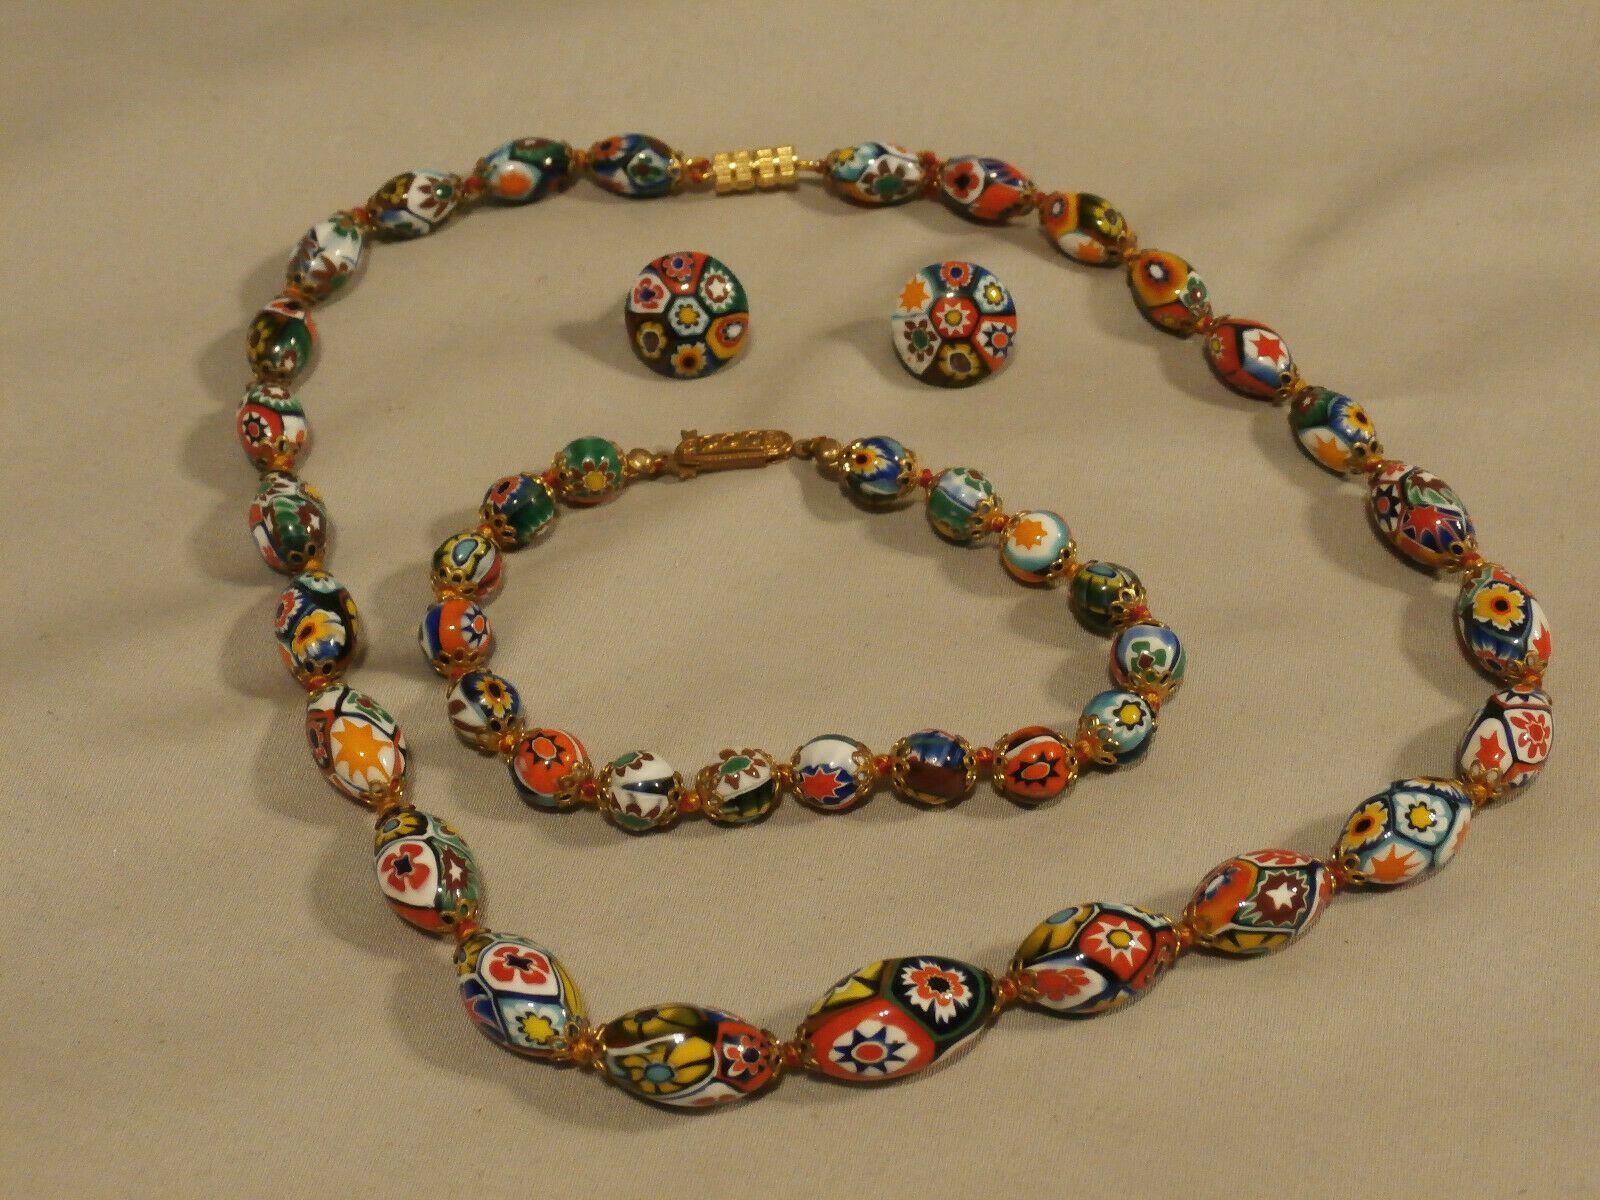 Vintage Murano Glass Graduated Millefiori Bead Necklace Bracelet Earring Set Ebay 85 Bracelet Earring Set Earring Set Necklaces Bracelets